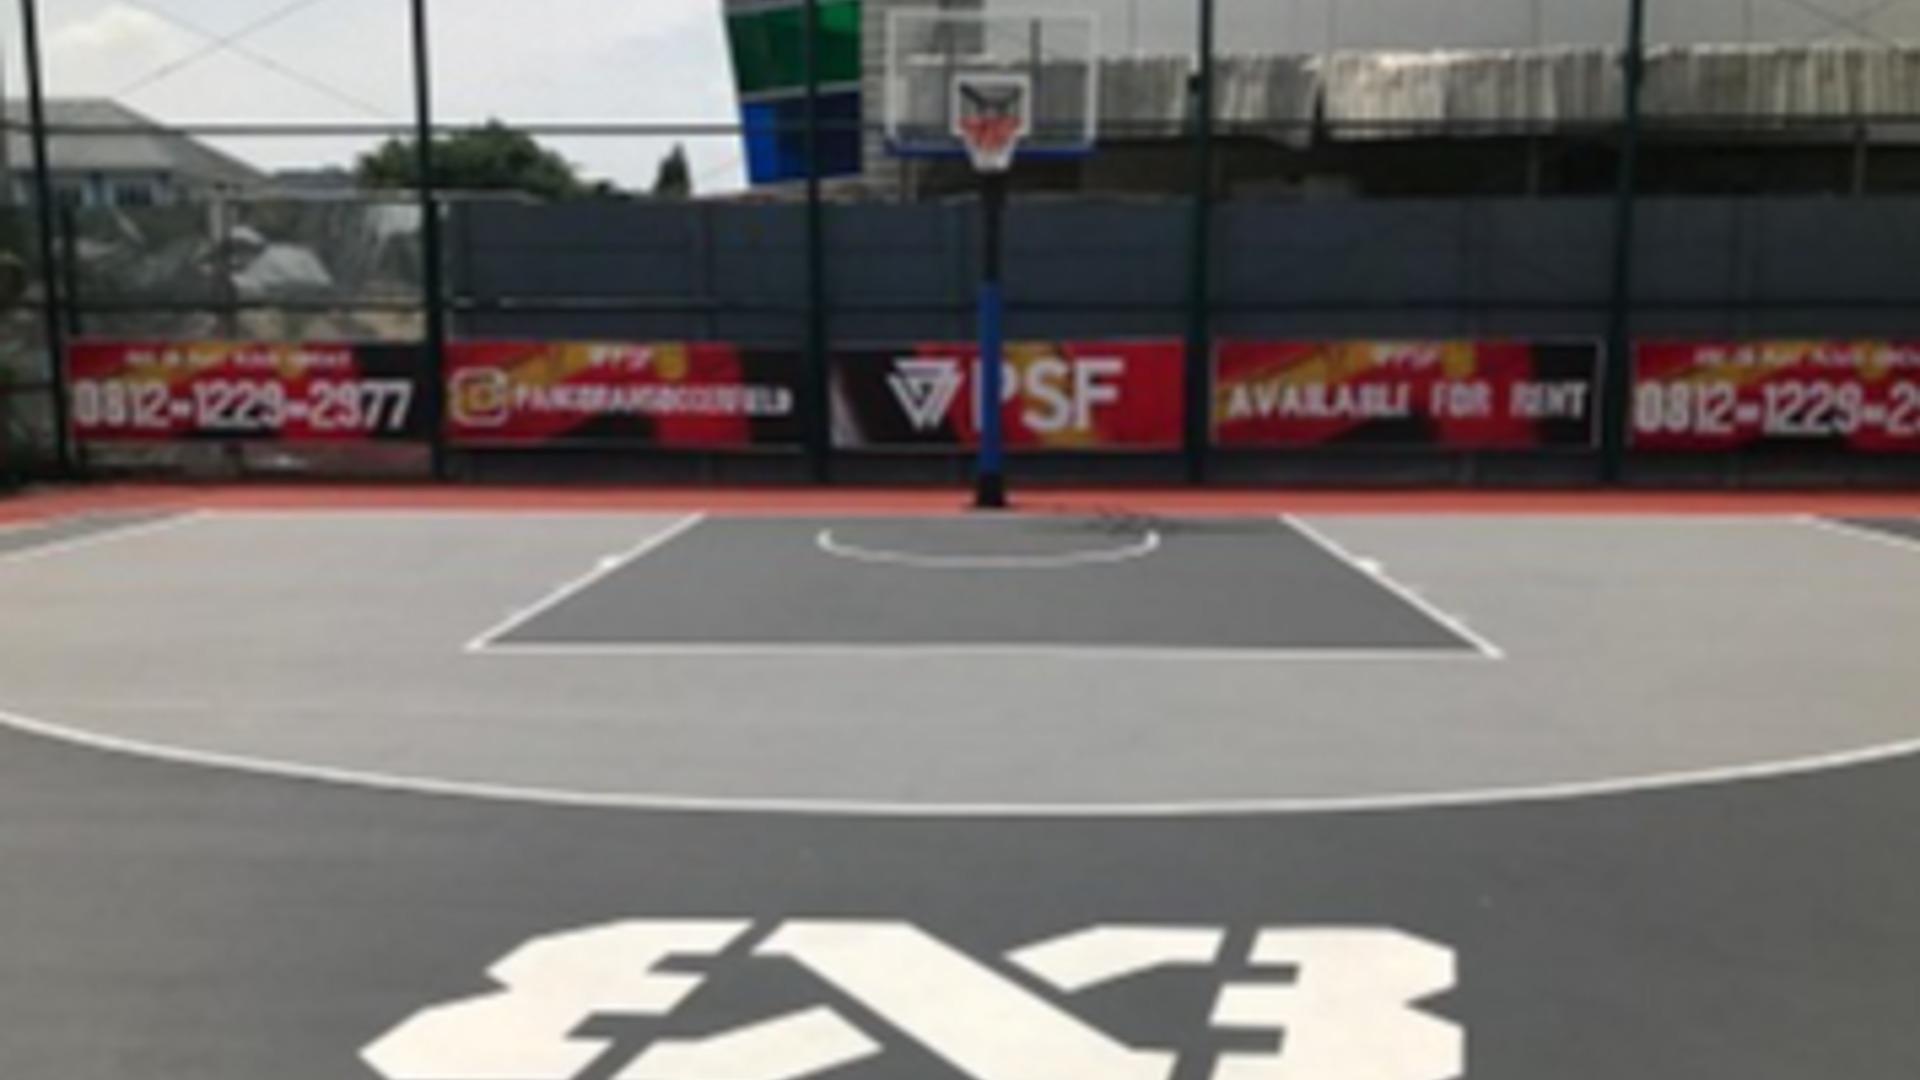 PSF Basketball